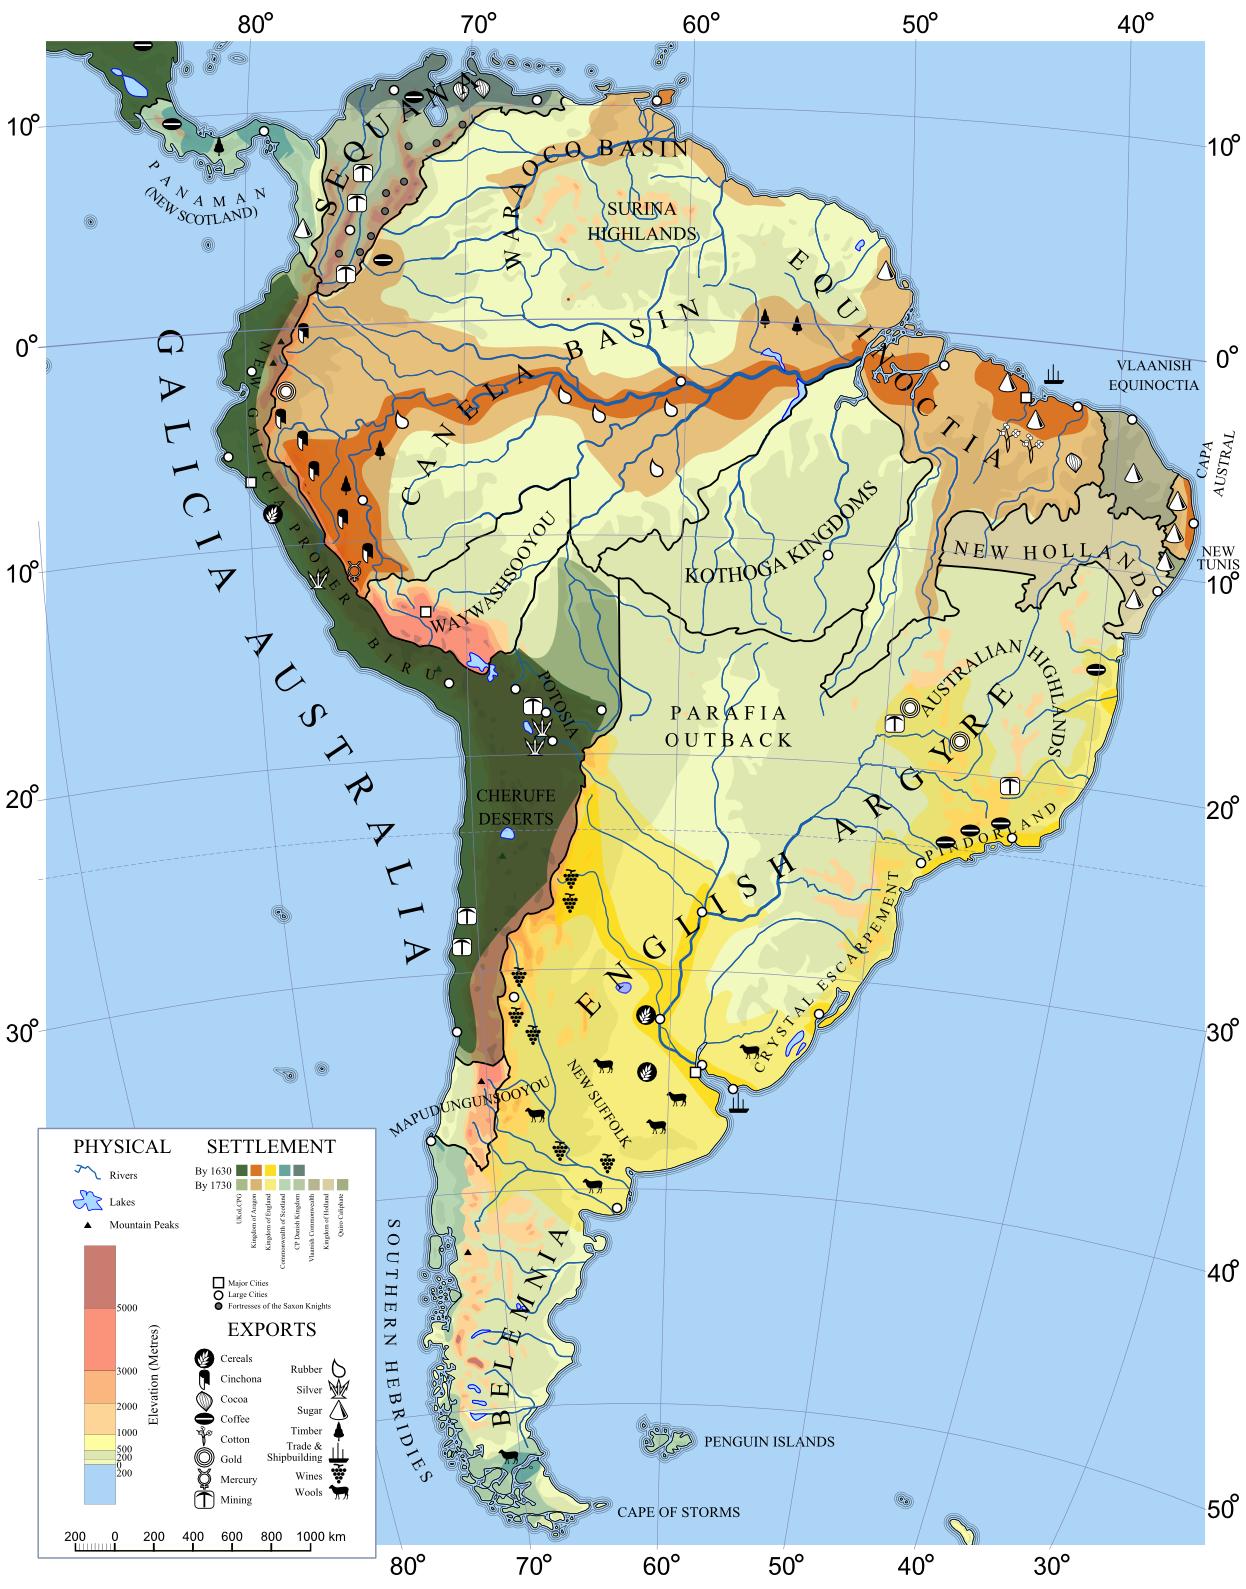 filetrinidad and tobago in south america mini map riverssvg south